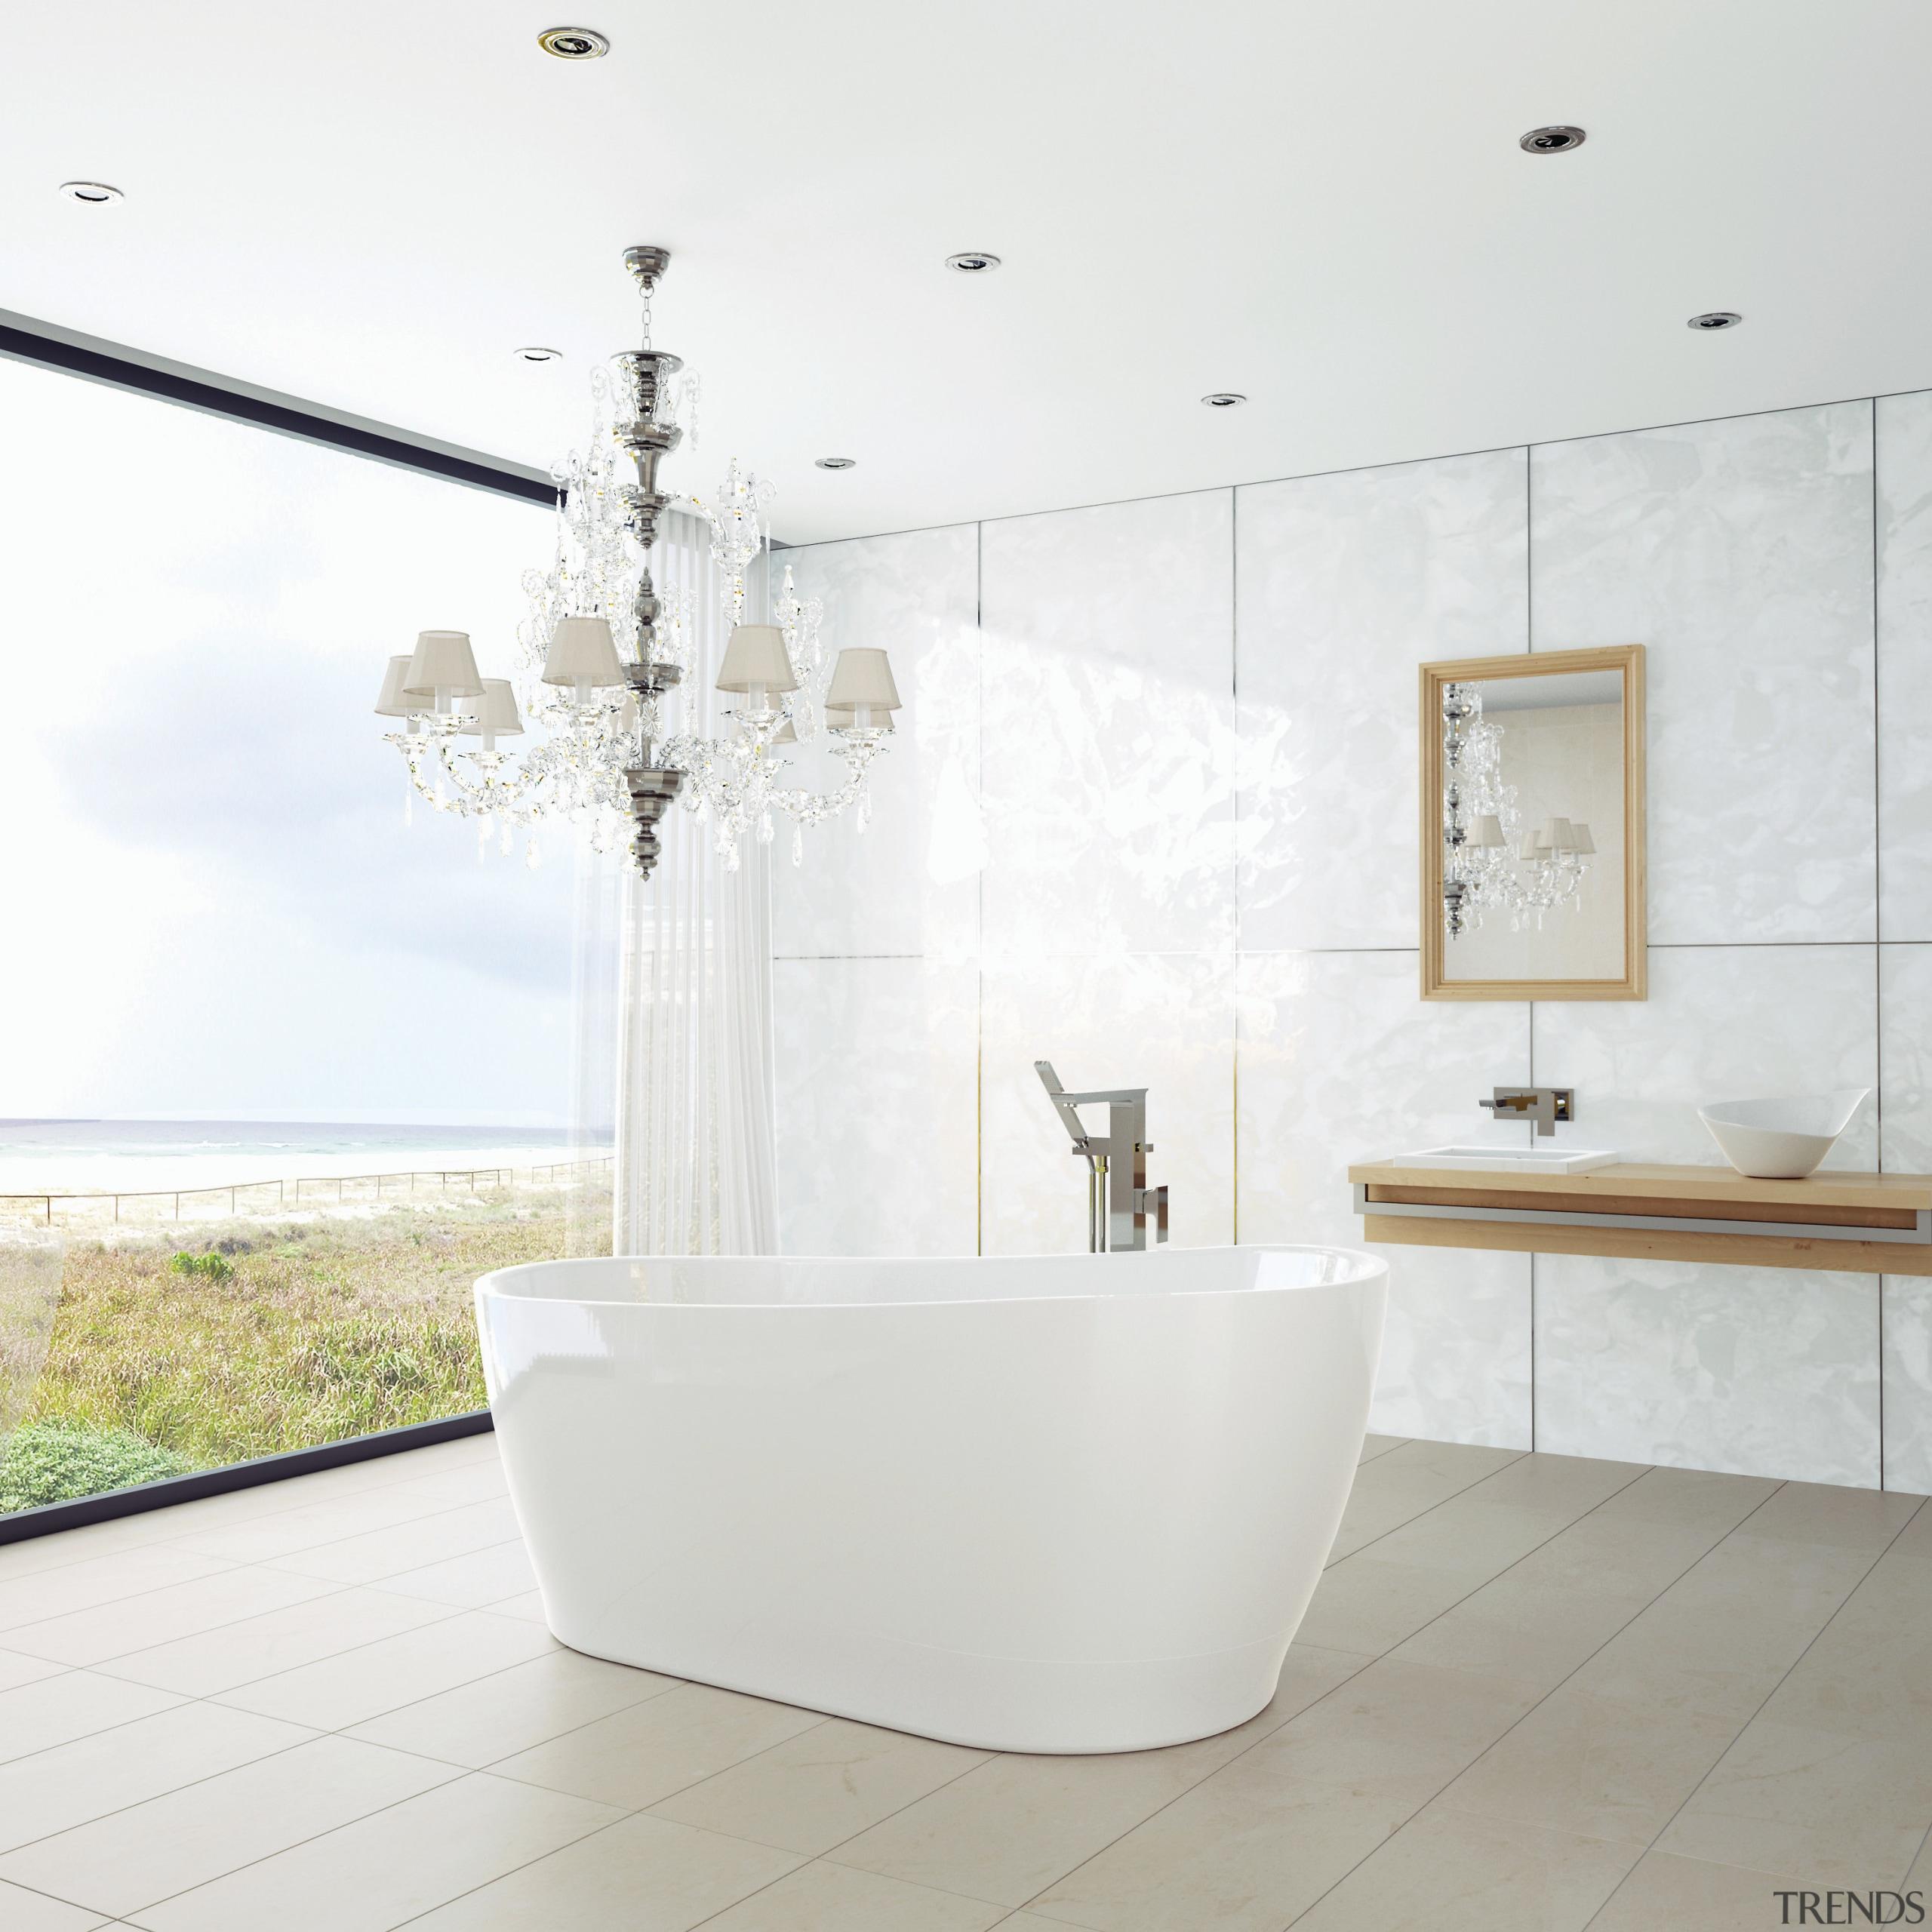 A Blanc bathtub by Caroma is the centrepiece bathroom, bathroom sink, ceramic, floor, interior design, plumbing fixture, product design, room, sink, tap, tile, white